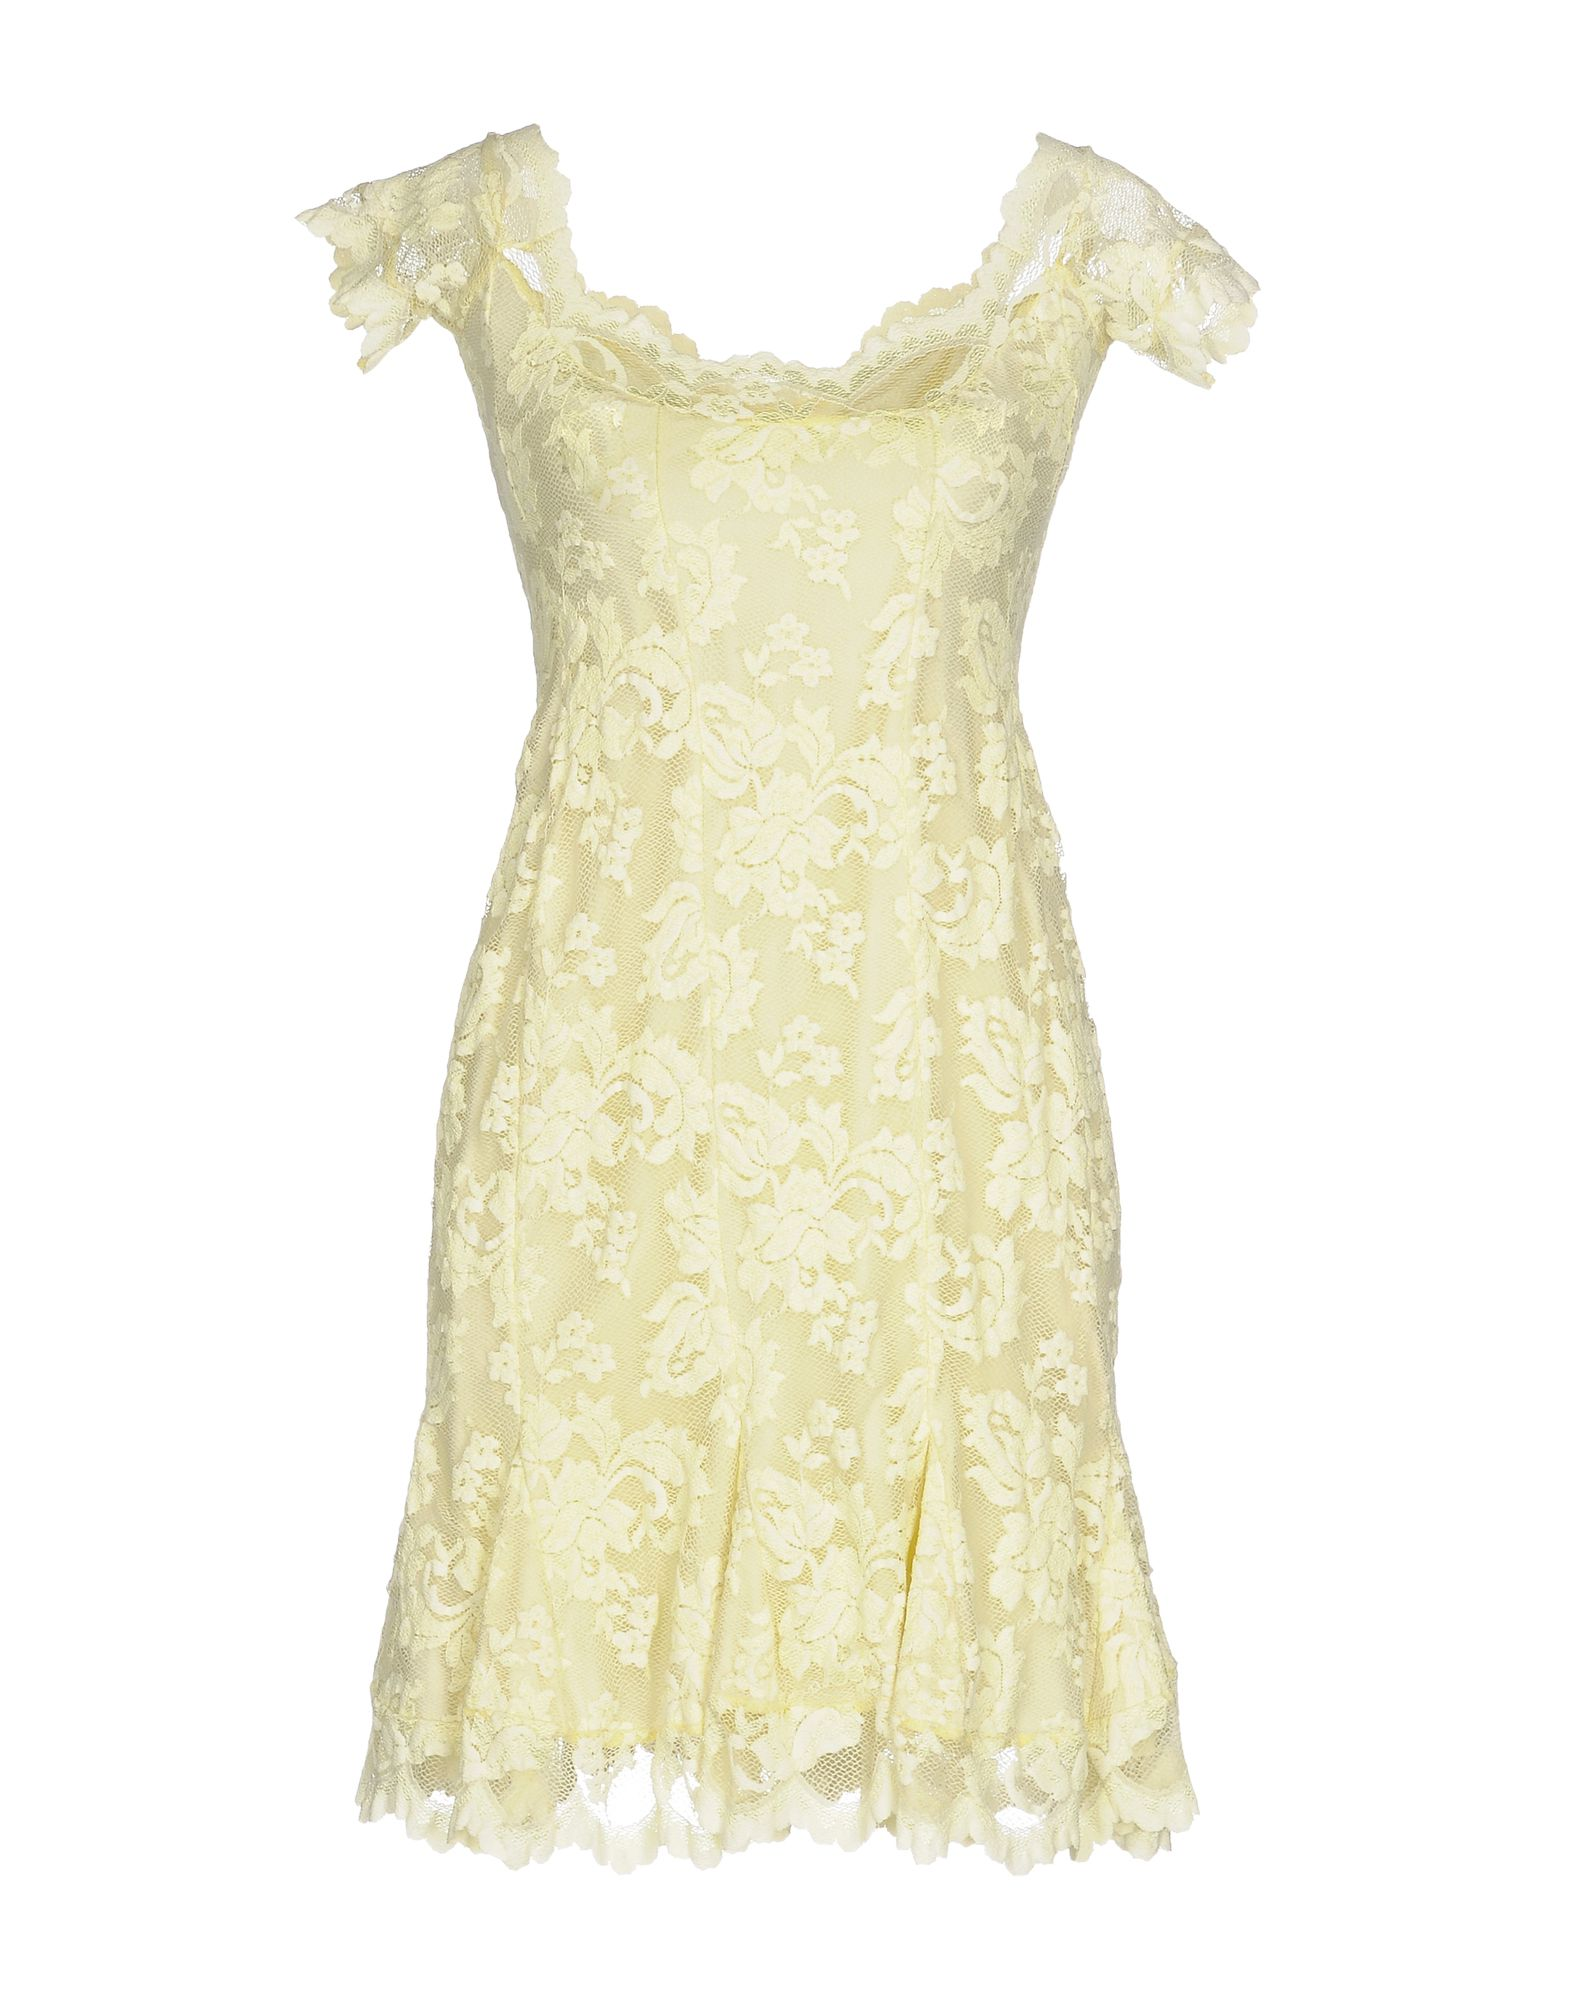 BALENSI Short Dress in Light Yellow